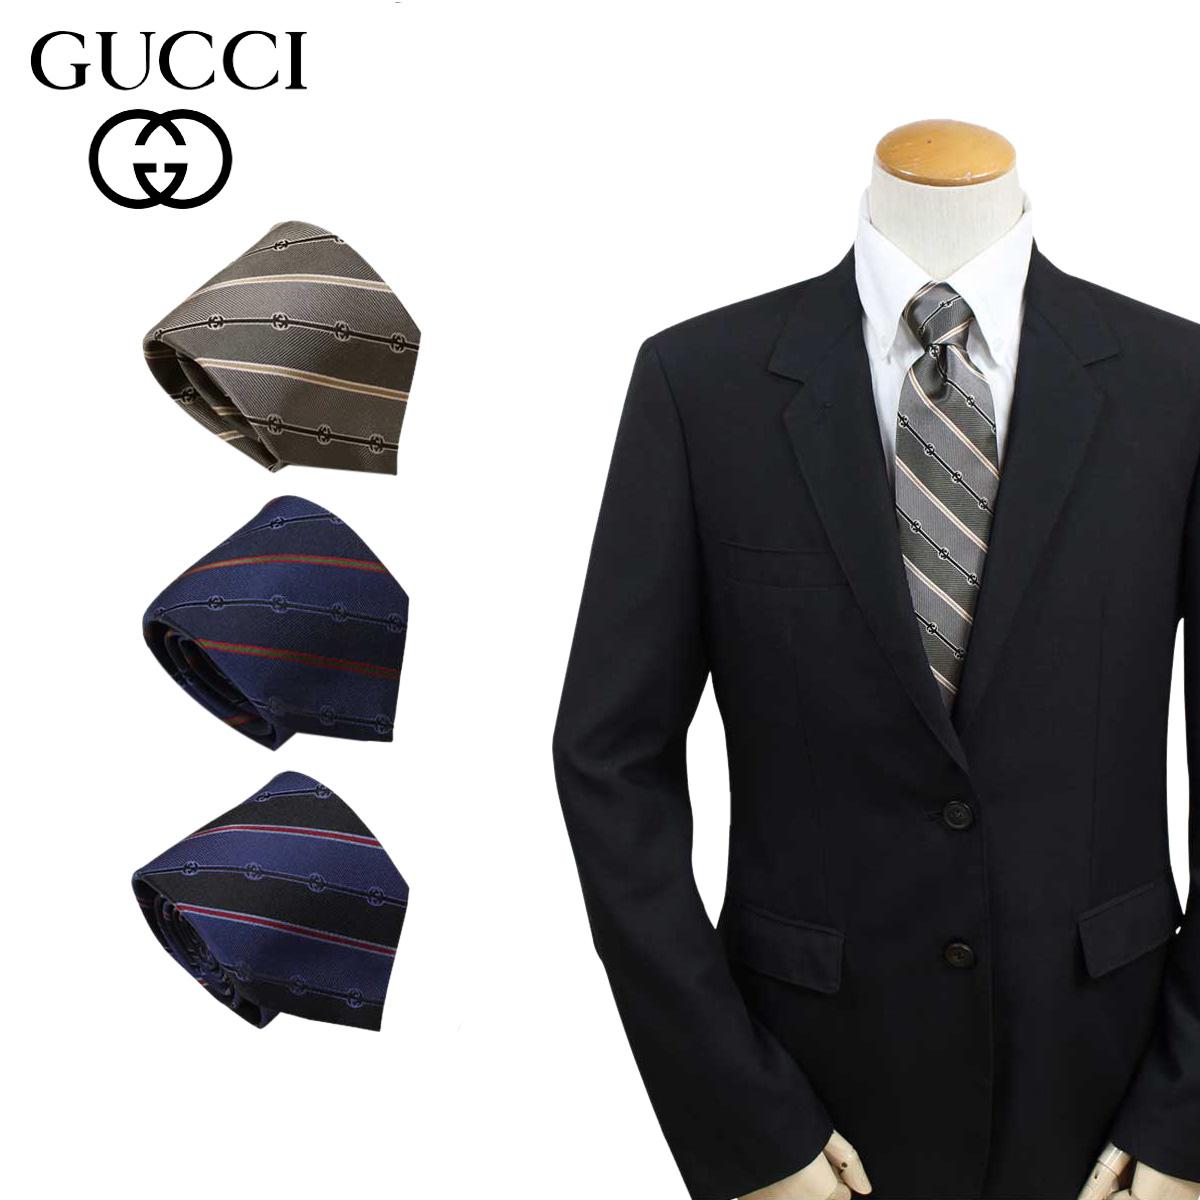 dba29652dc1d GUCCI グッチグッチとは100年以上もの歴史を誇るファッションブランドで、イタリアのフィレンツェで発祥しました。グッチの創立者であるグッチオ?